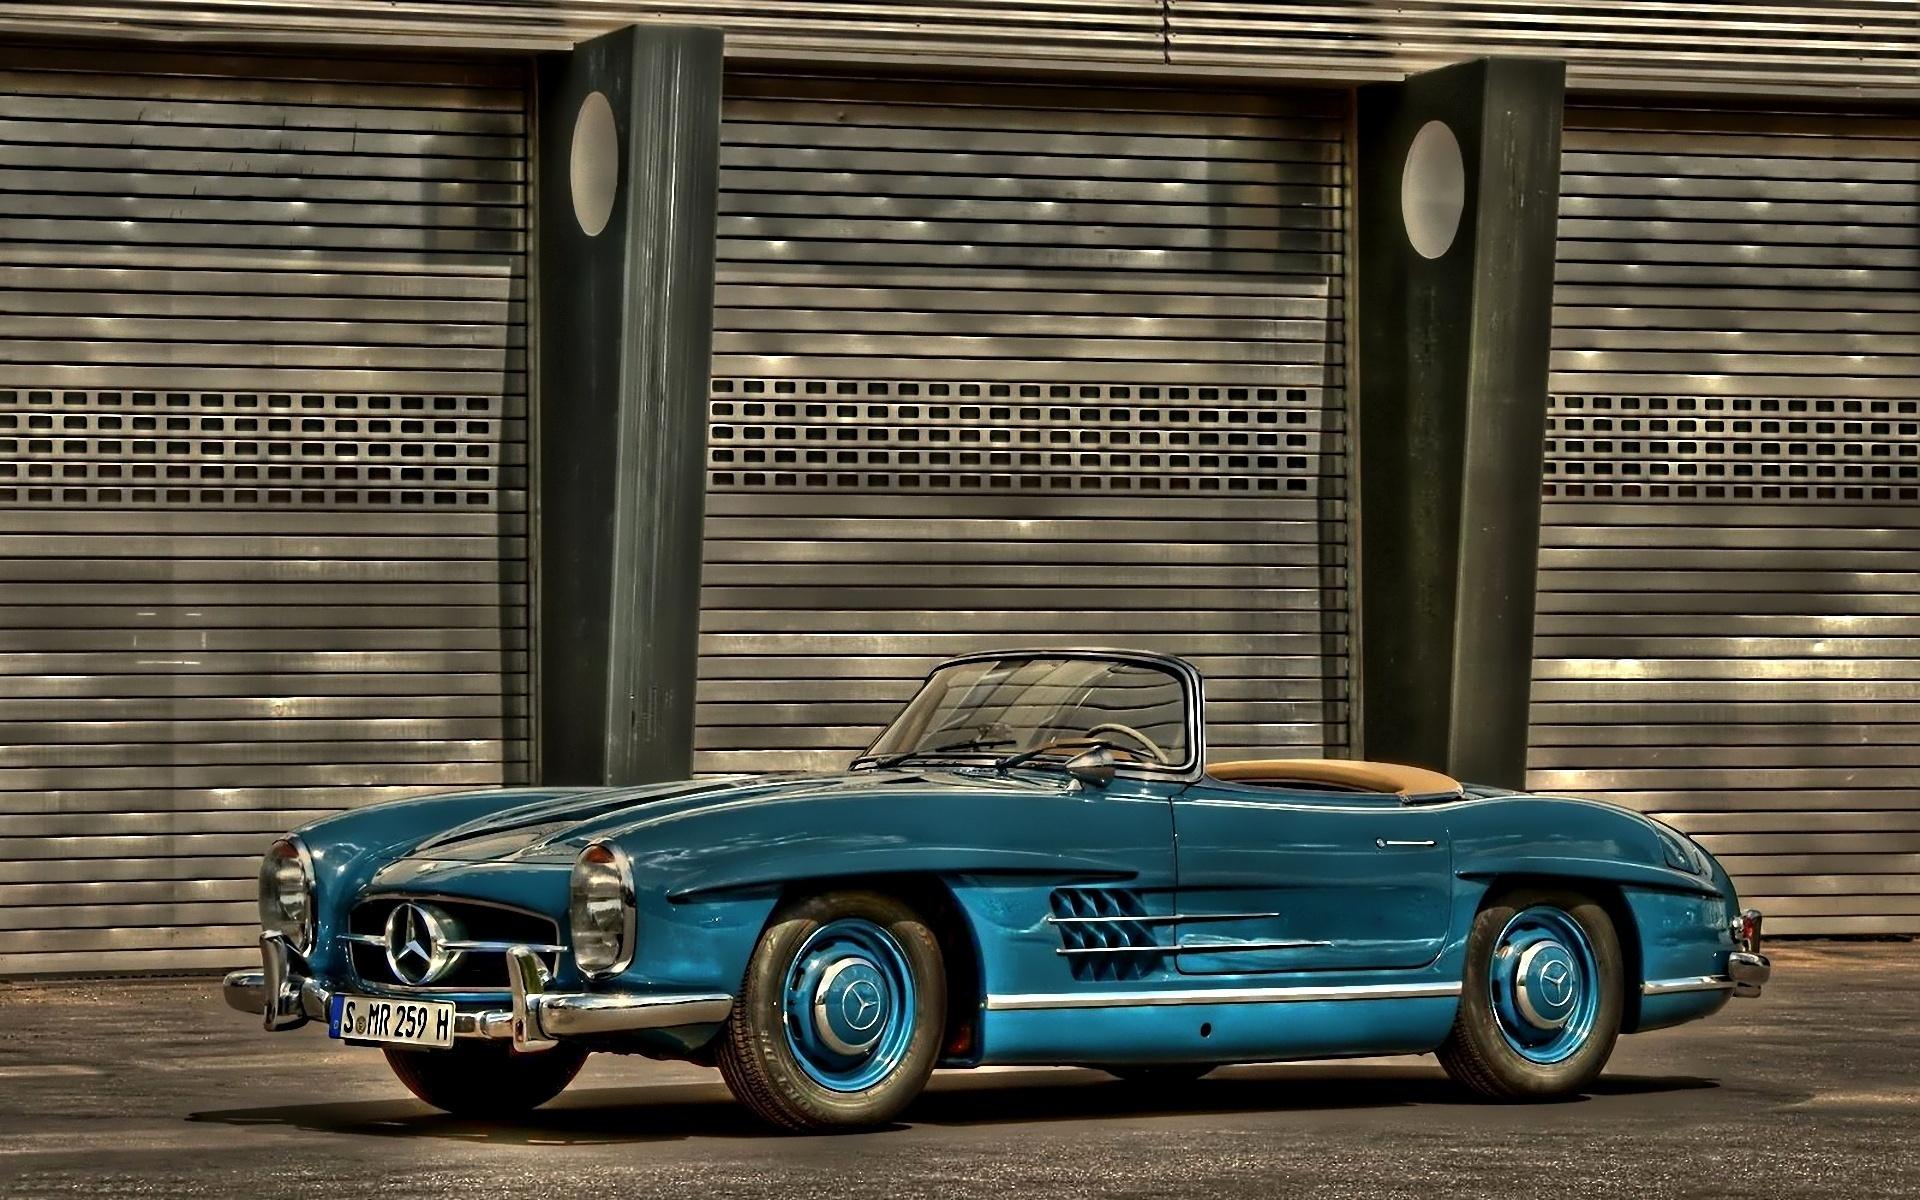 Mercedes benz vintage car wallpaper 1920x1200 83225 for Mercedes benz vintage cars